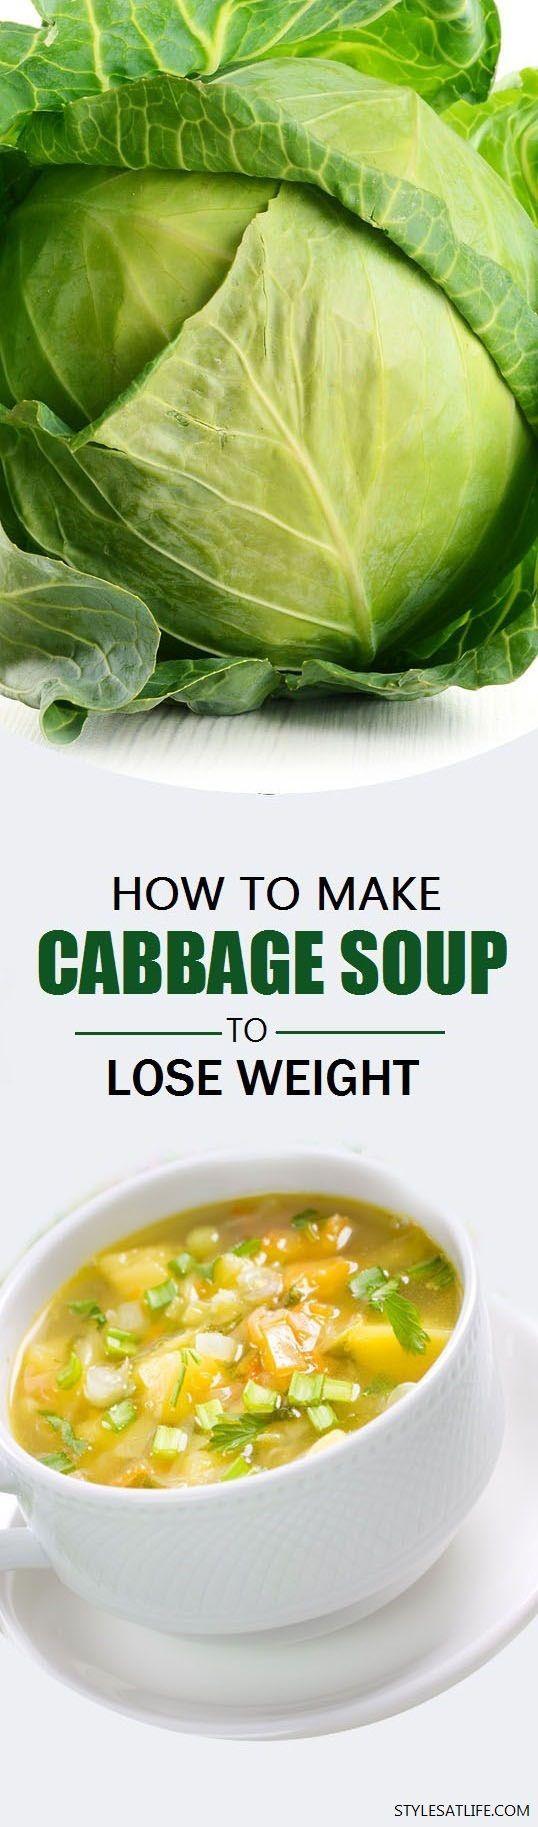 Charlotte crosby diet plan amazon